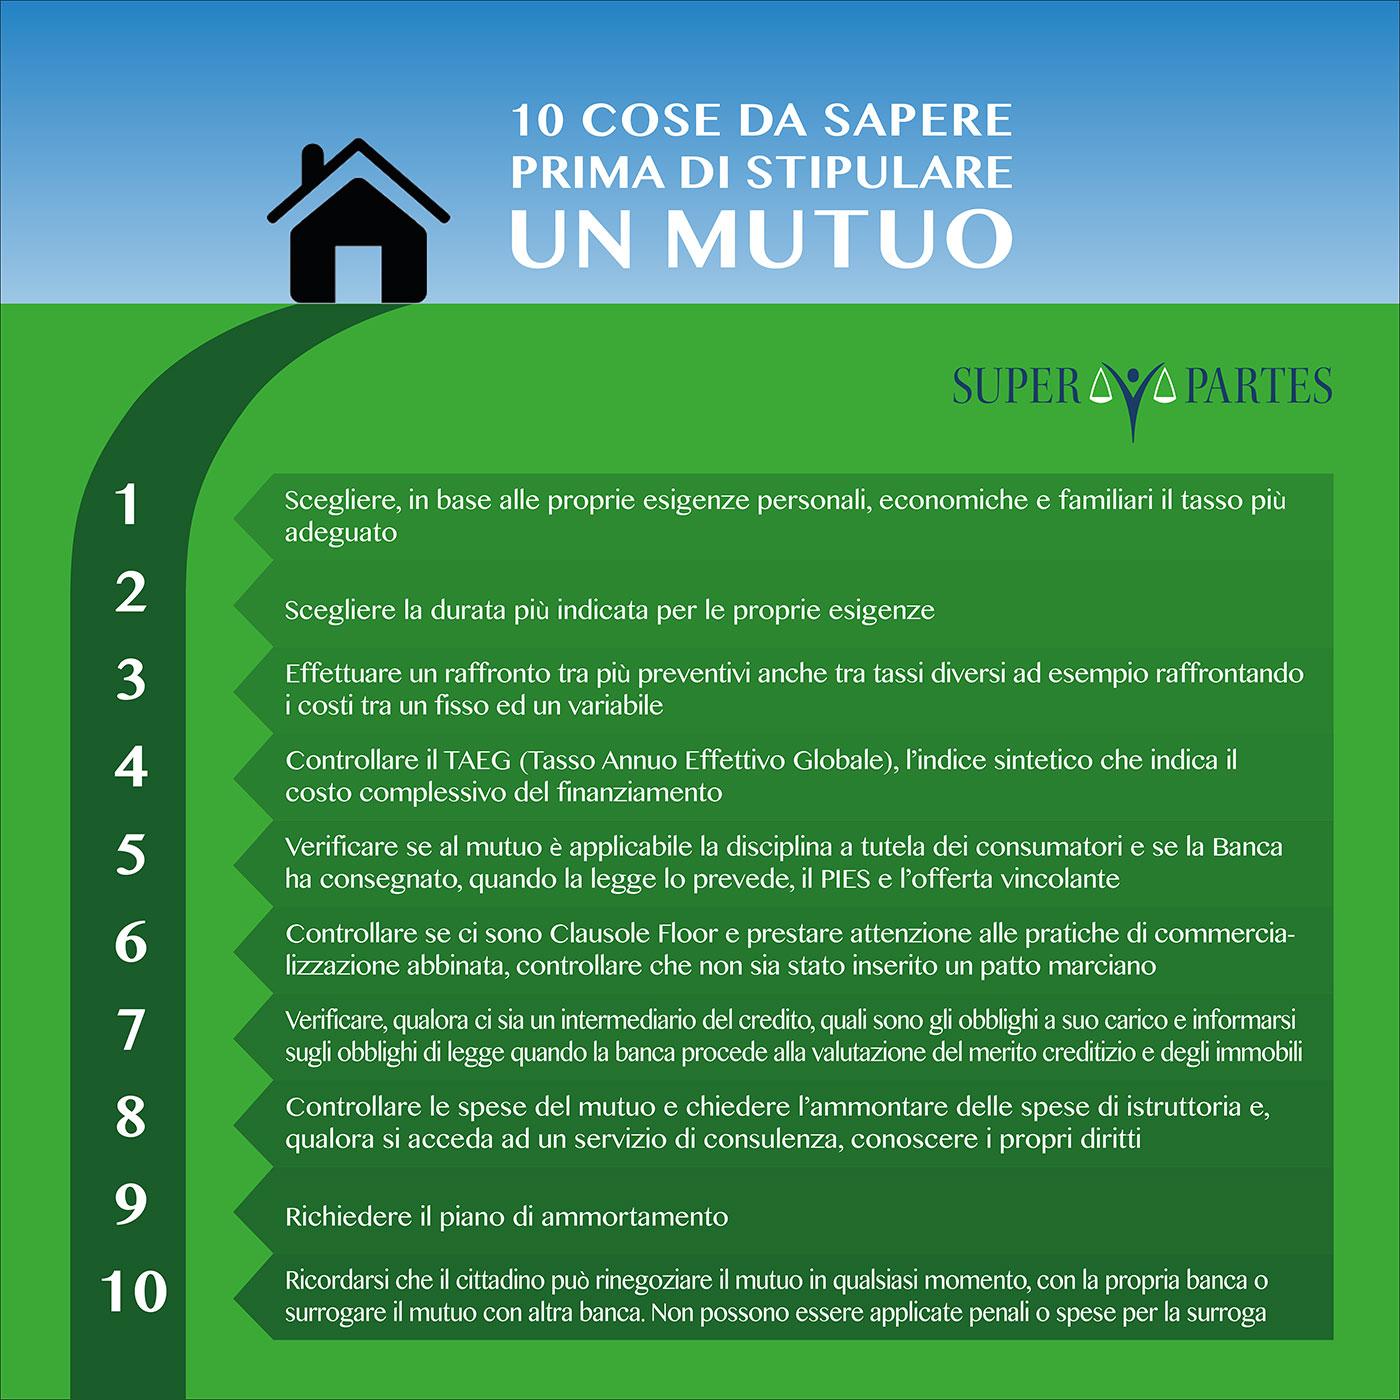 10-cose-da-sapere-per-mutuo